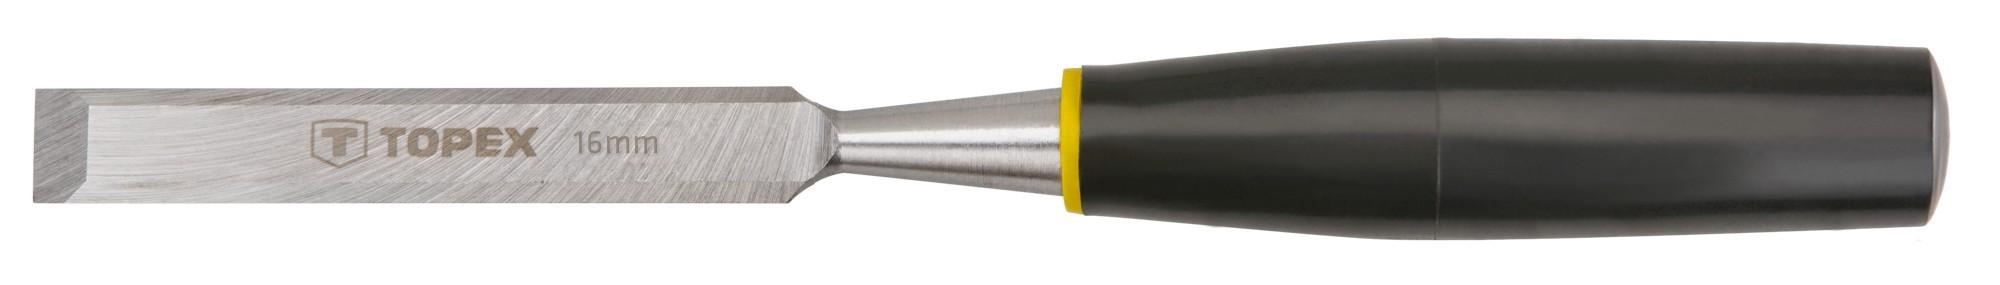 Favésõ 16 mm lapos, mûanyag nyelû | TOPEX 09A116